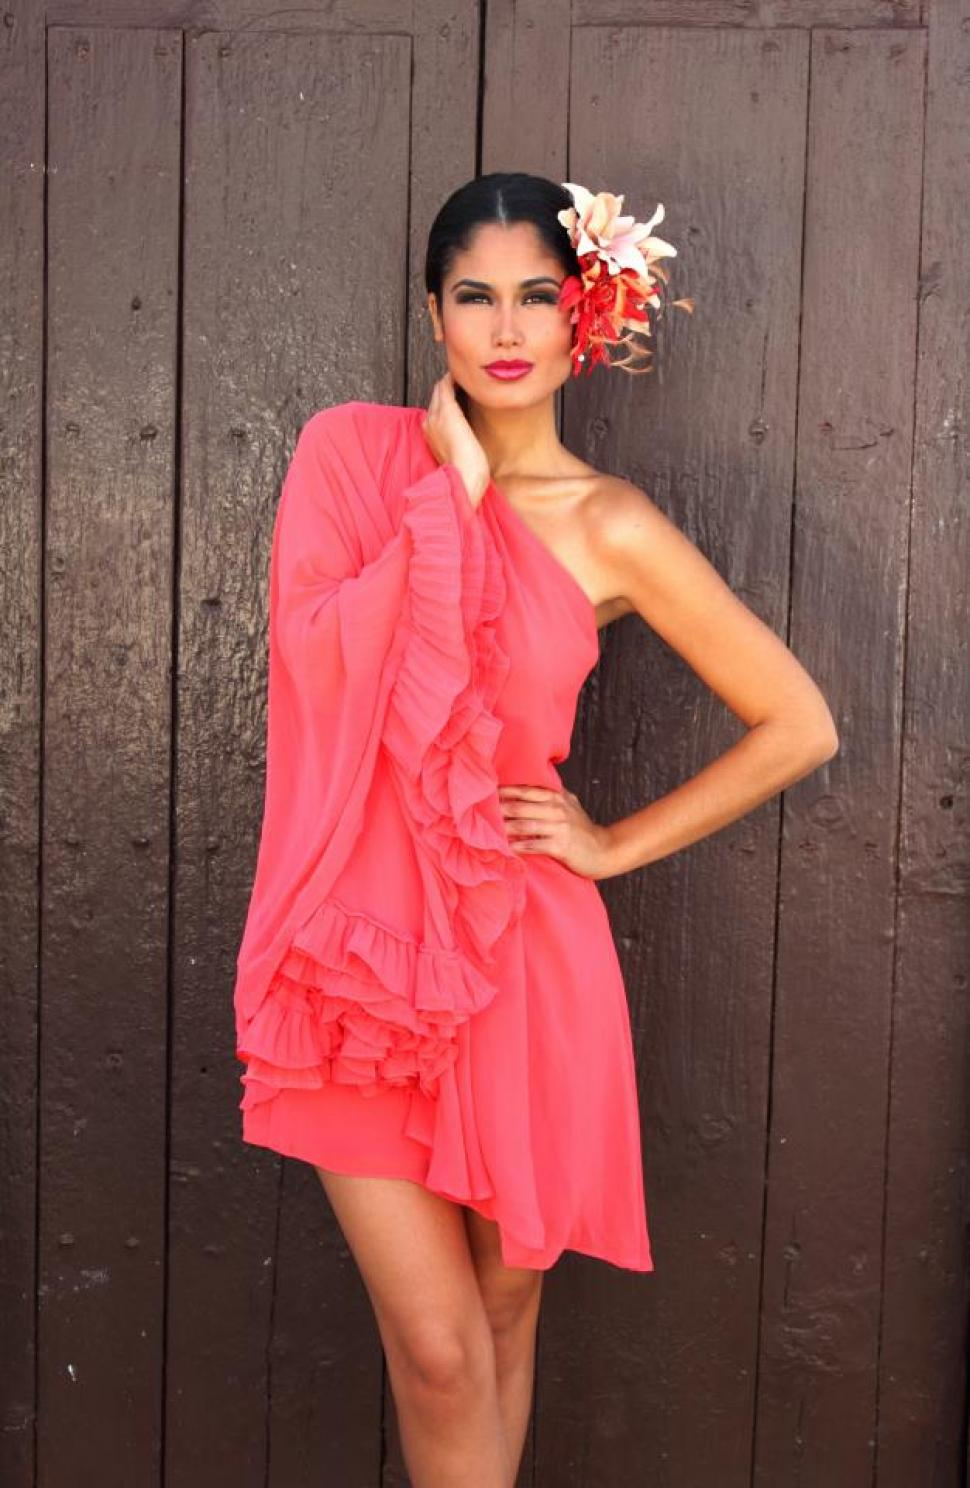 patricia yurena rodriguez, miss espana 2008/2013, 1st runner-up de miss universe 2013. - Página 2 Patric10